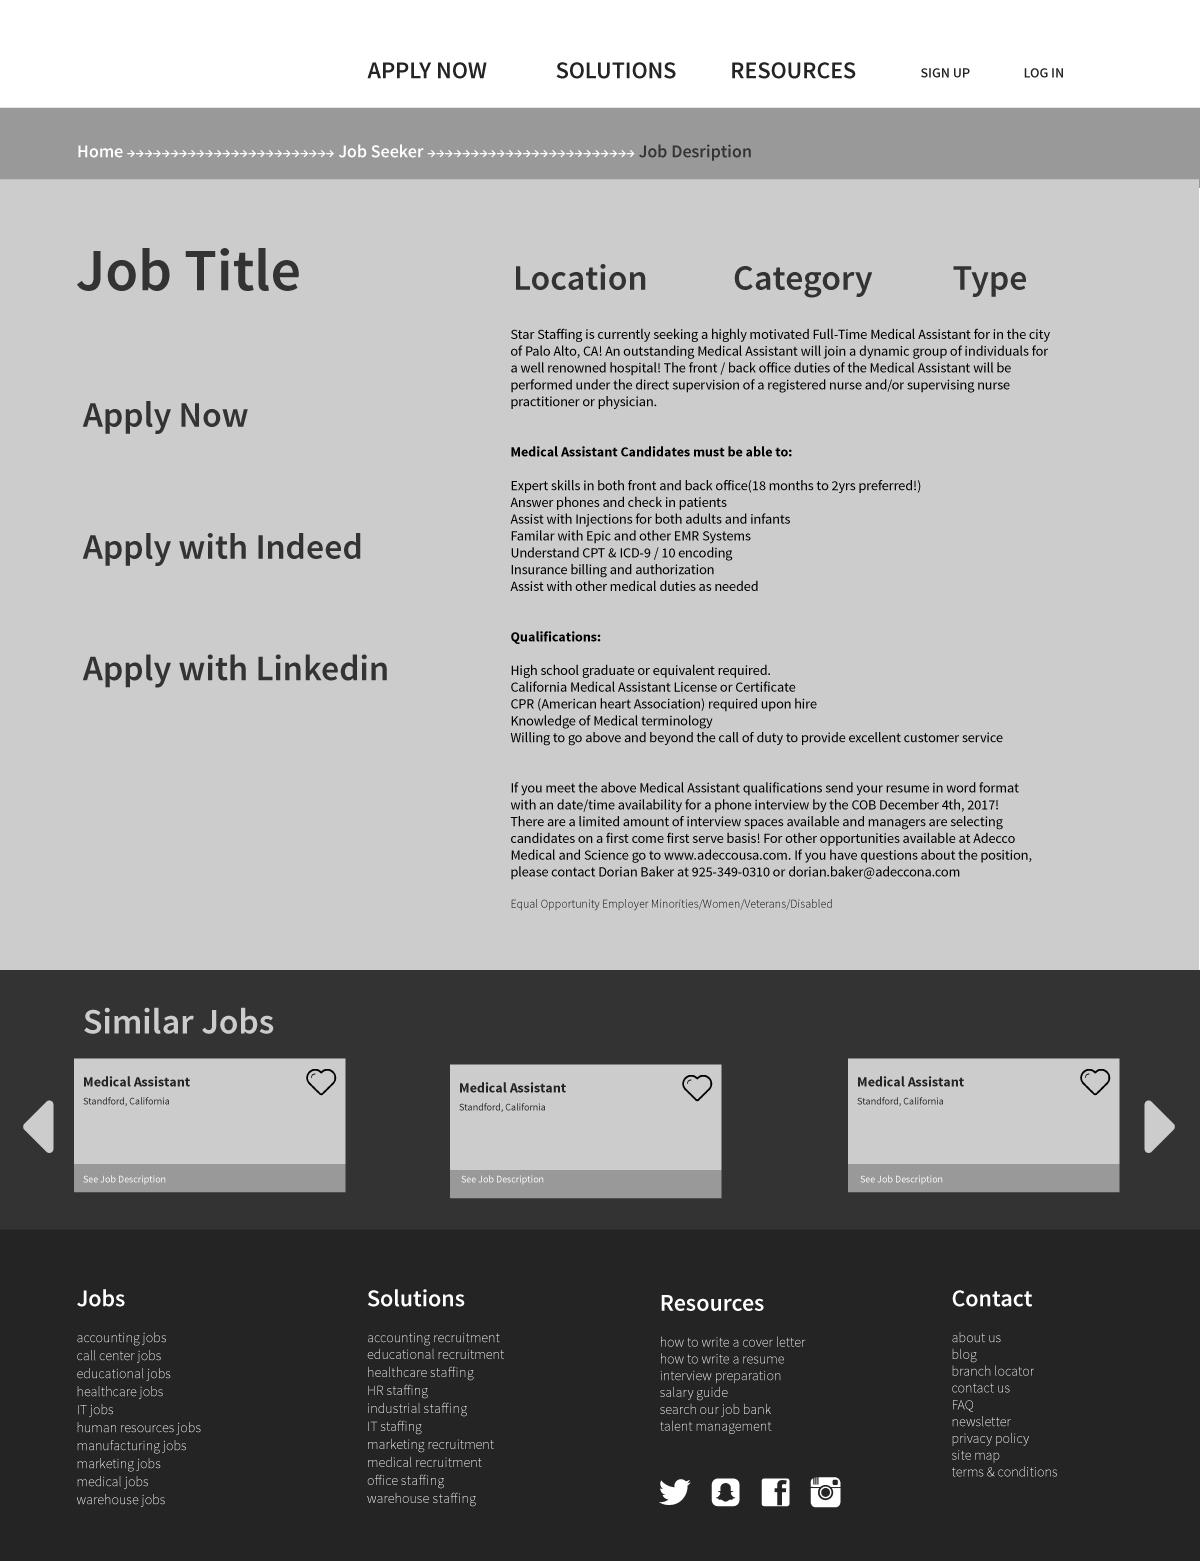 SS_job-description_wireframe.jpg